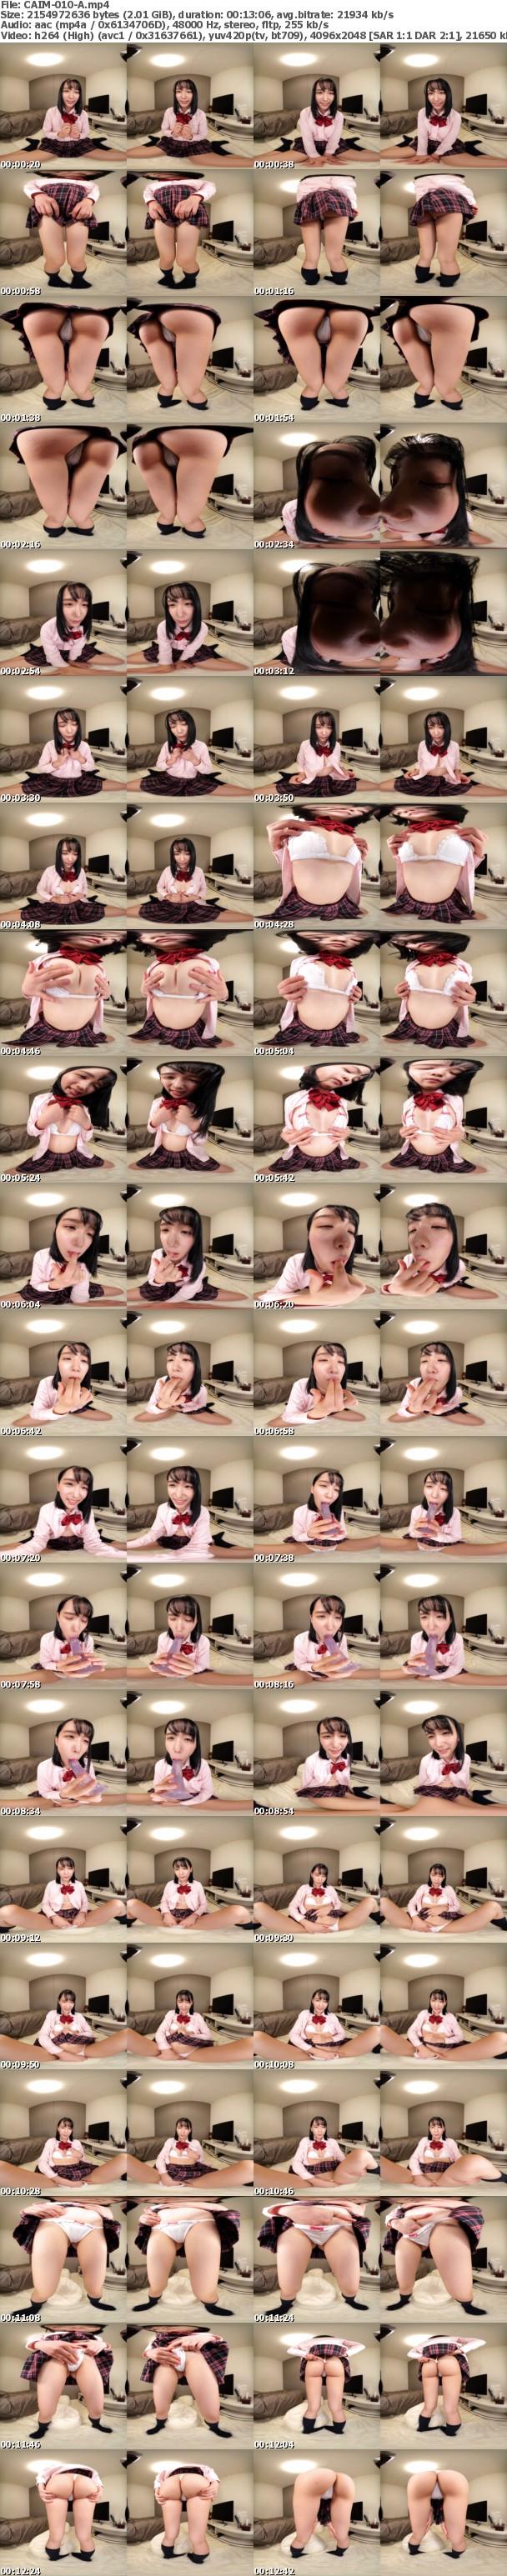 (VR) CAIM-010 限界着エロ無双!! 天使的清純美少女「天羽成美」最強レベルの伝説級VR2